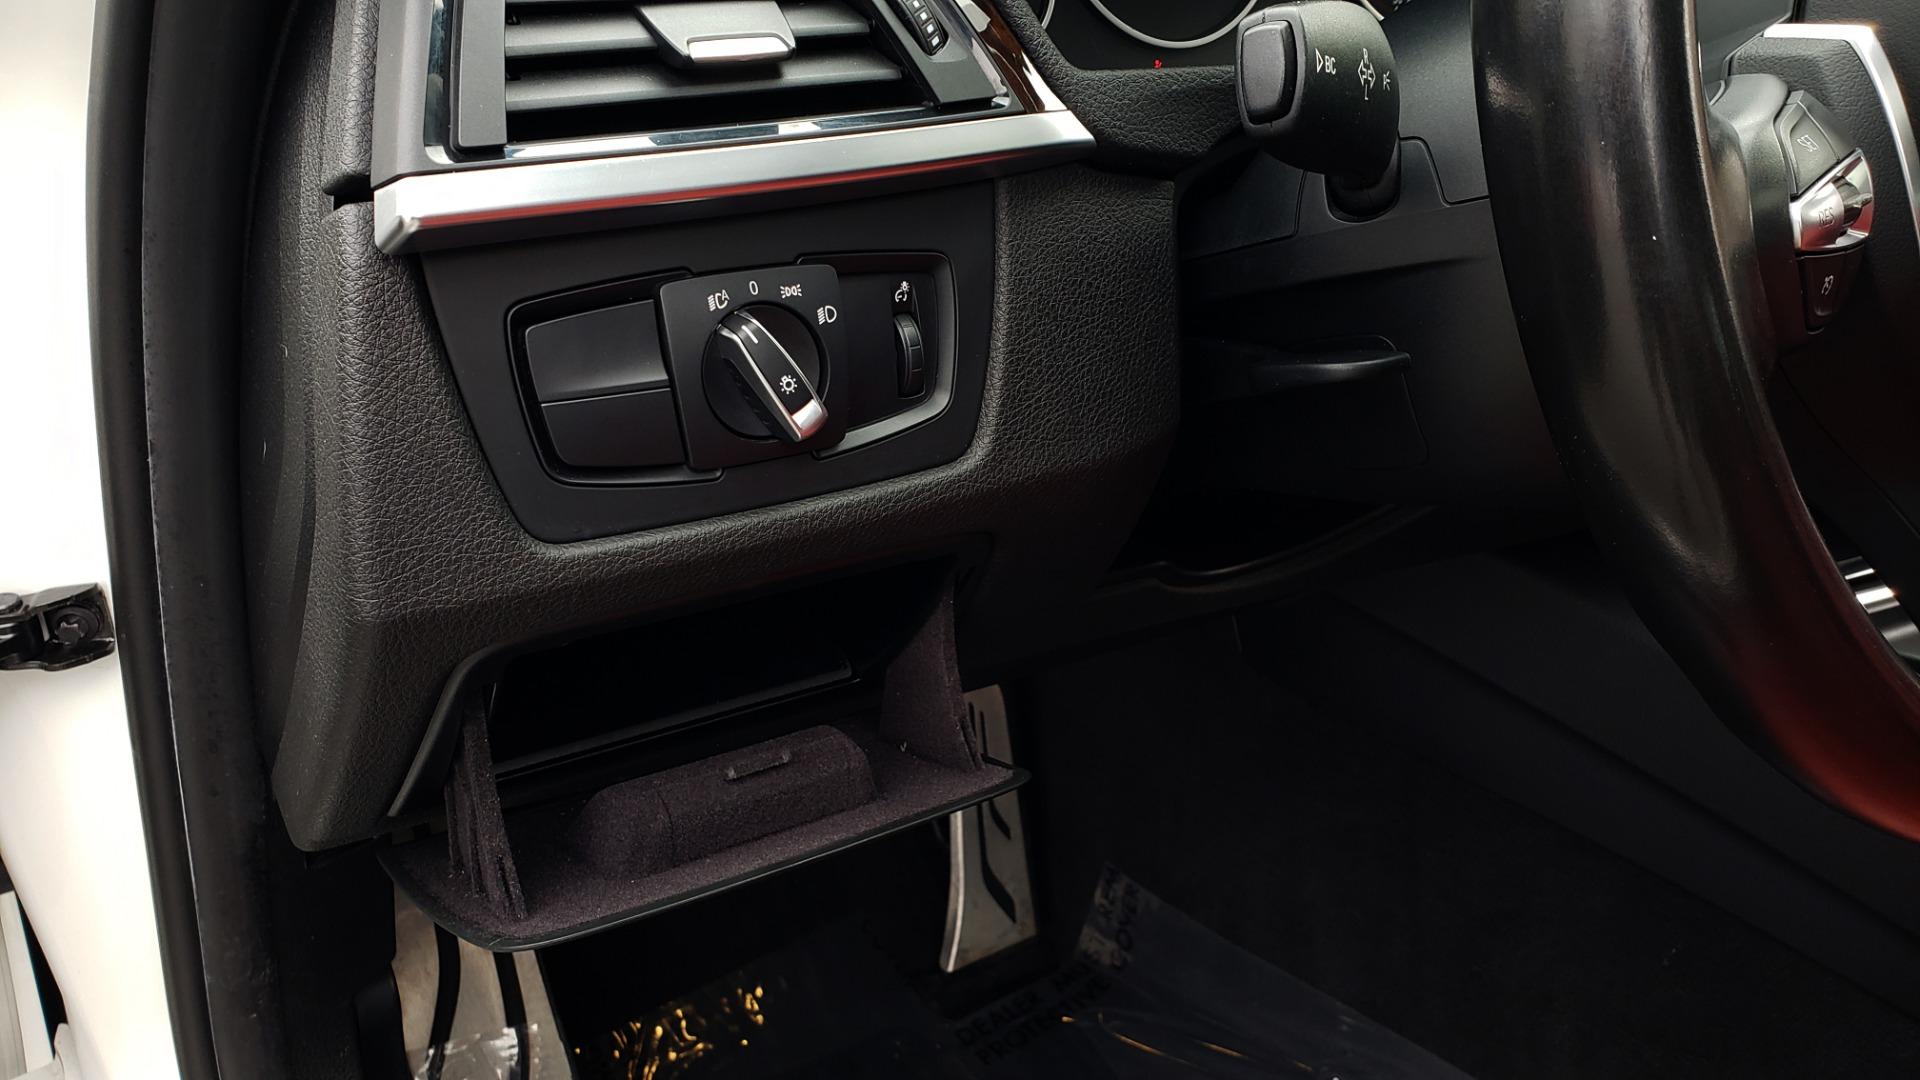 Used 2015 BMW 3 Series 335I M-SPORT / PREM PKG / HK SND / SUNROOF / REARVIEW for sale Sold at Formula Imports in Charlotte NC 28227 41